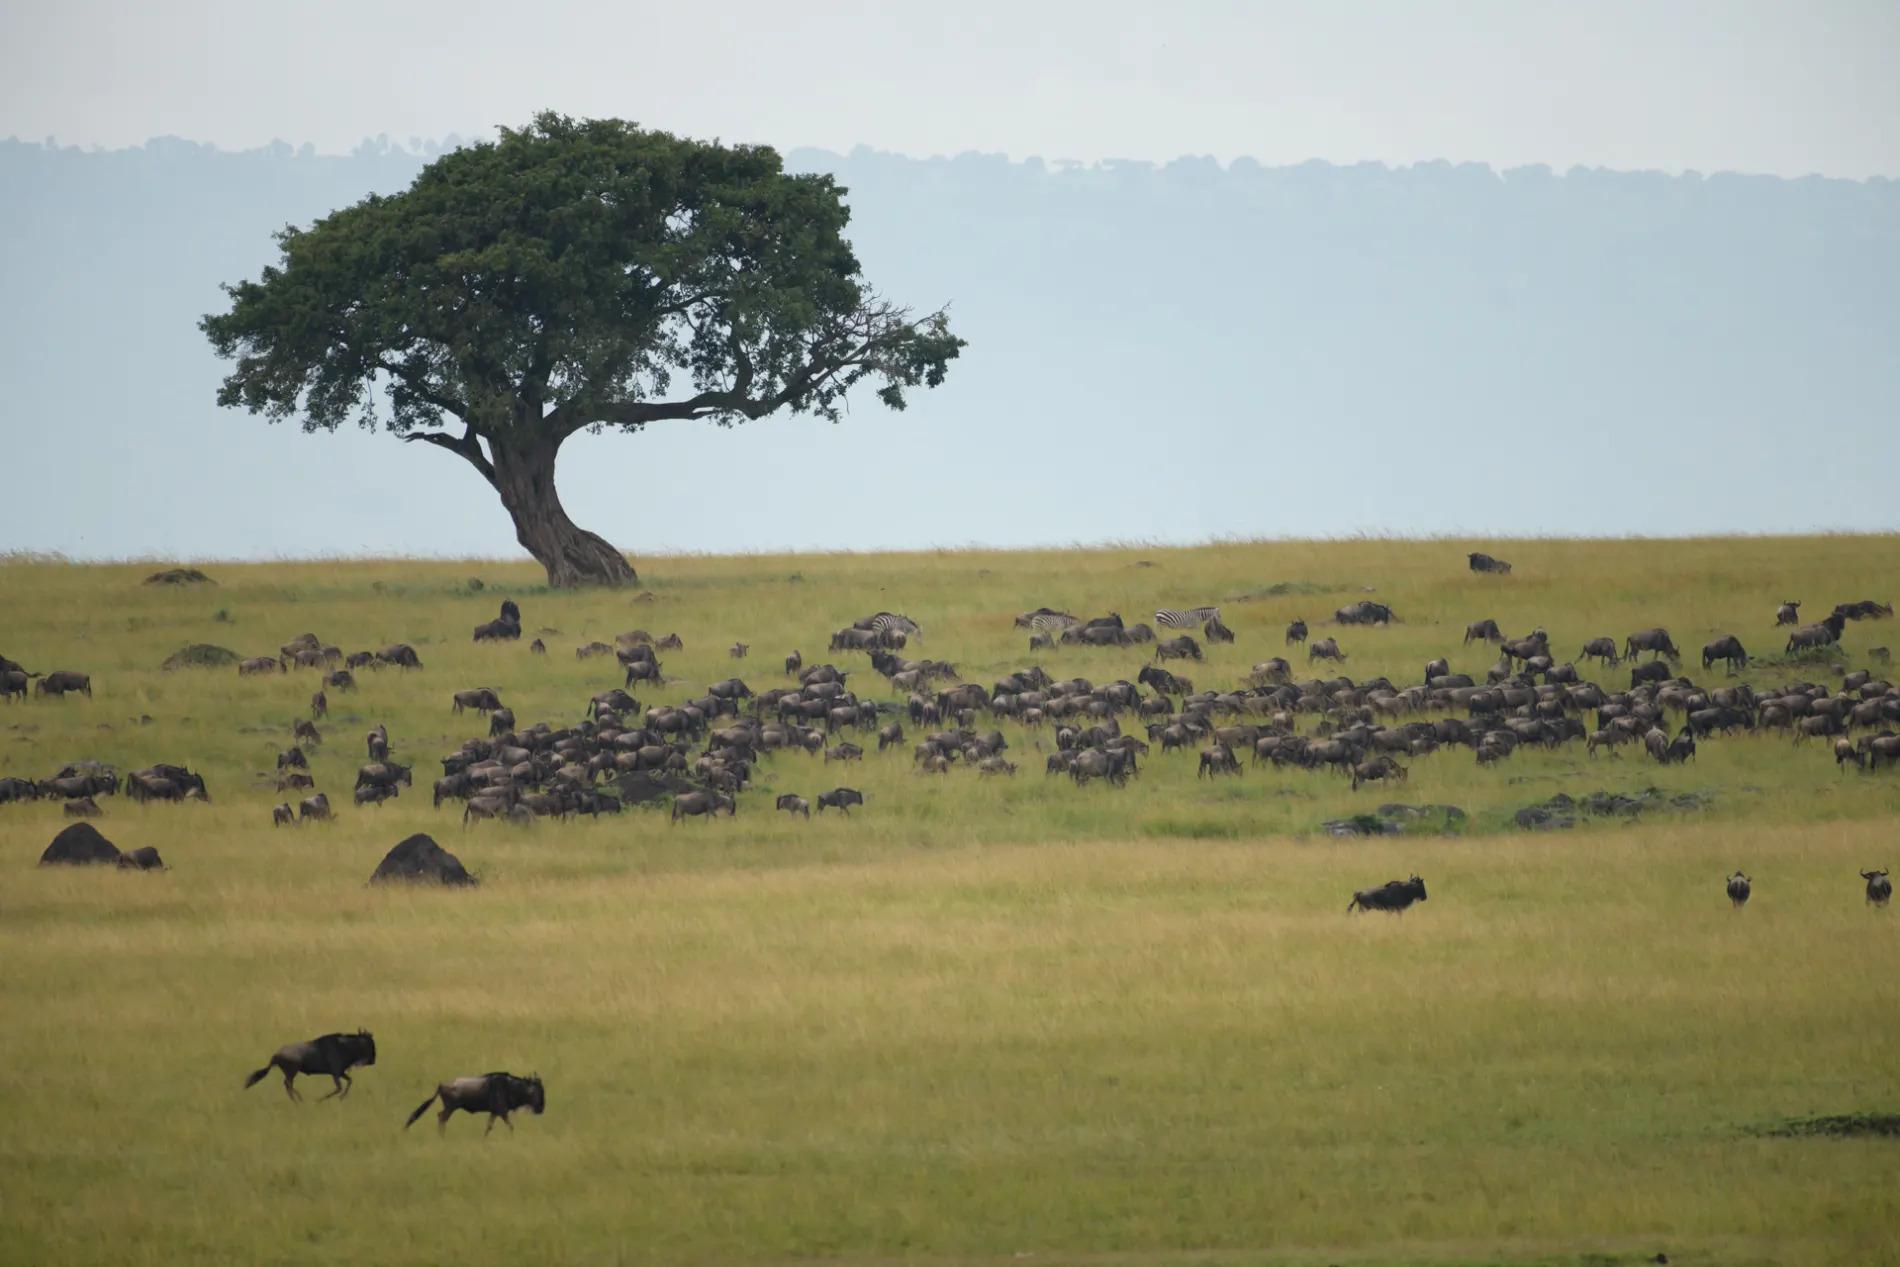 Wildebeest herd on the mara plains